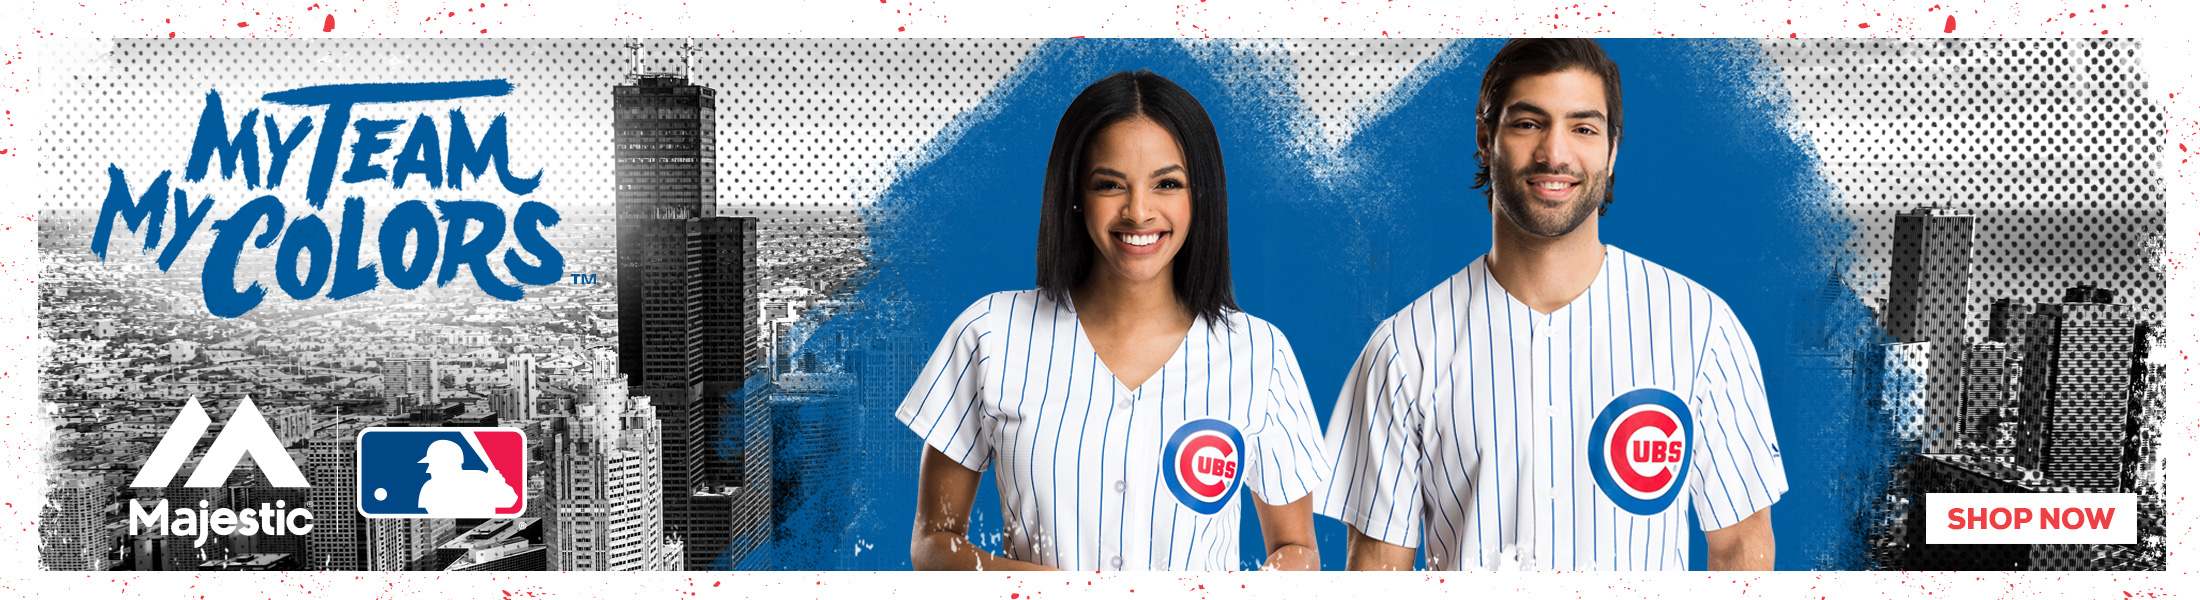 Chicago Cubs Jerseys at SportsWorldChicago.com